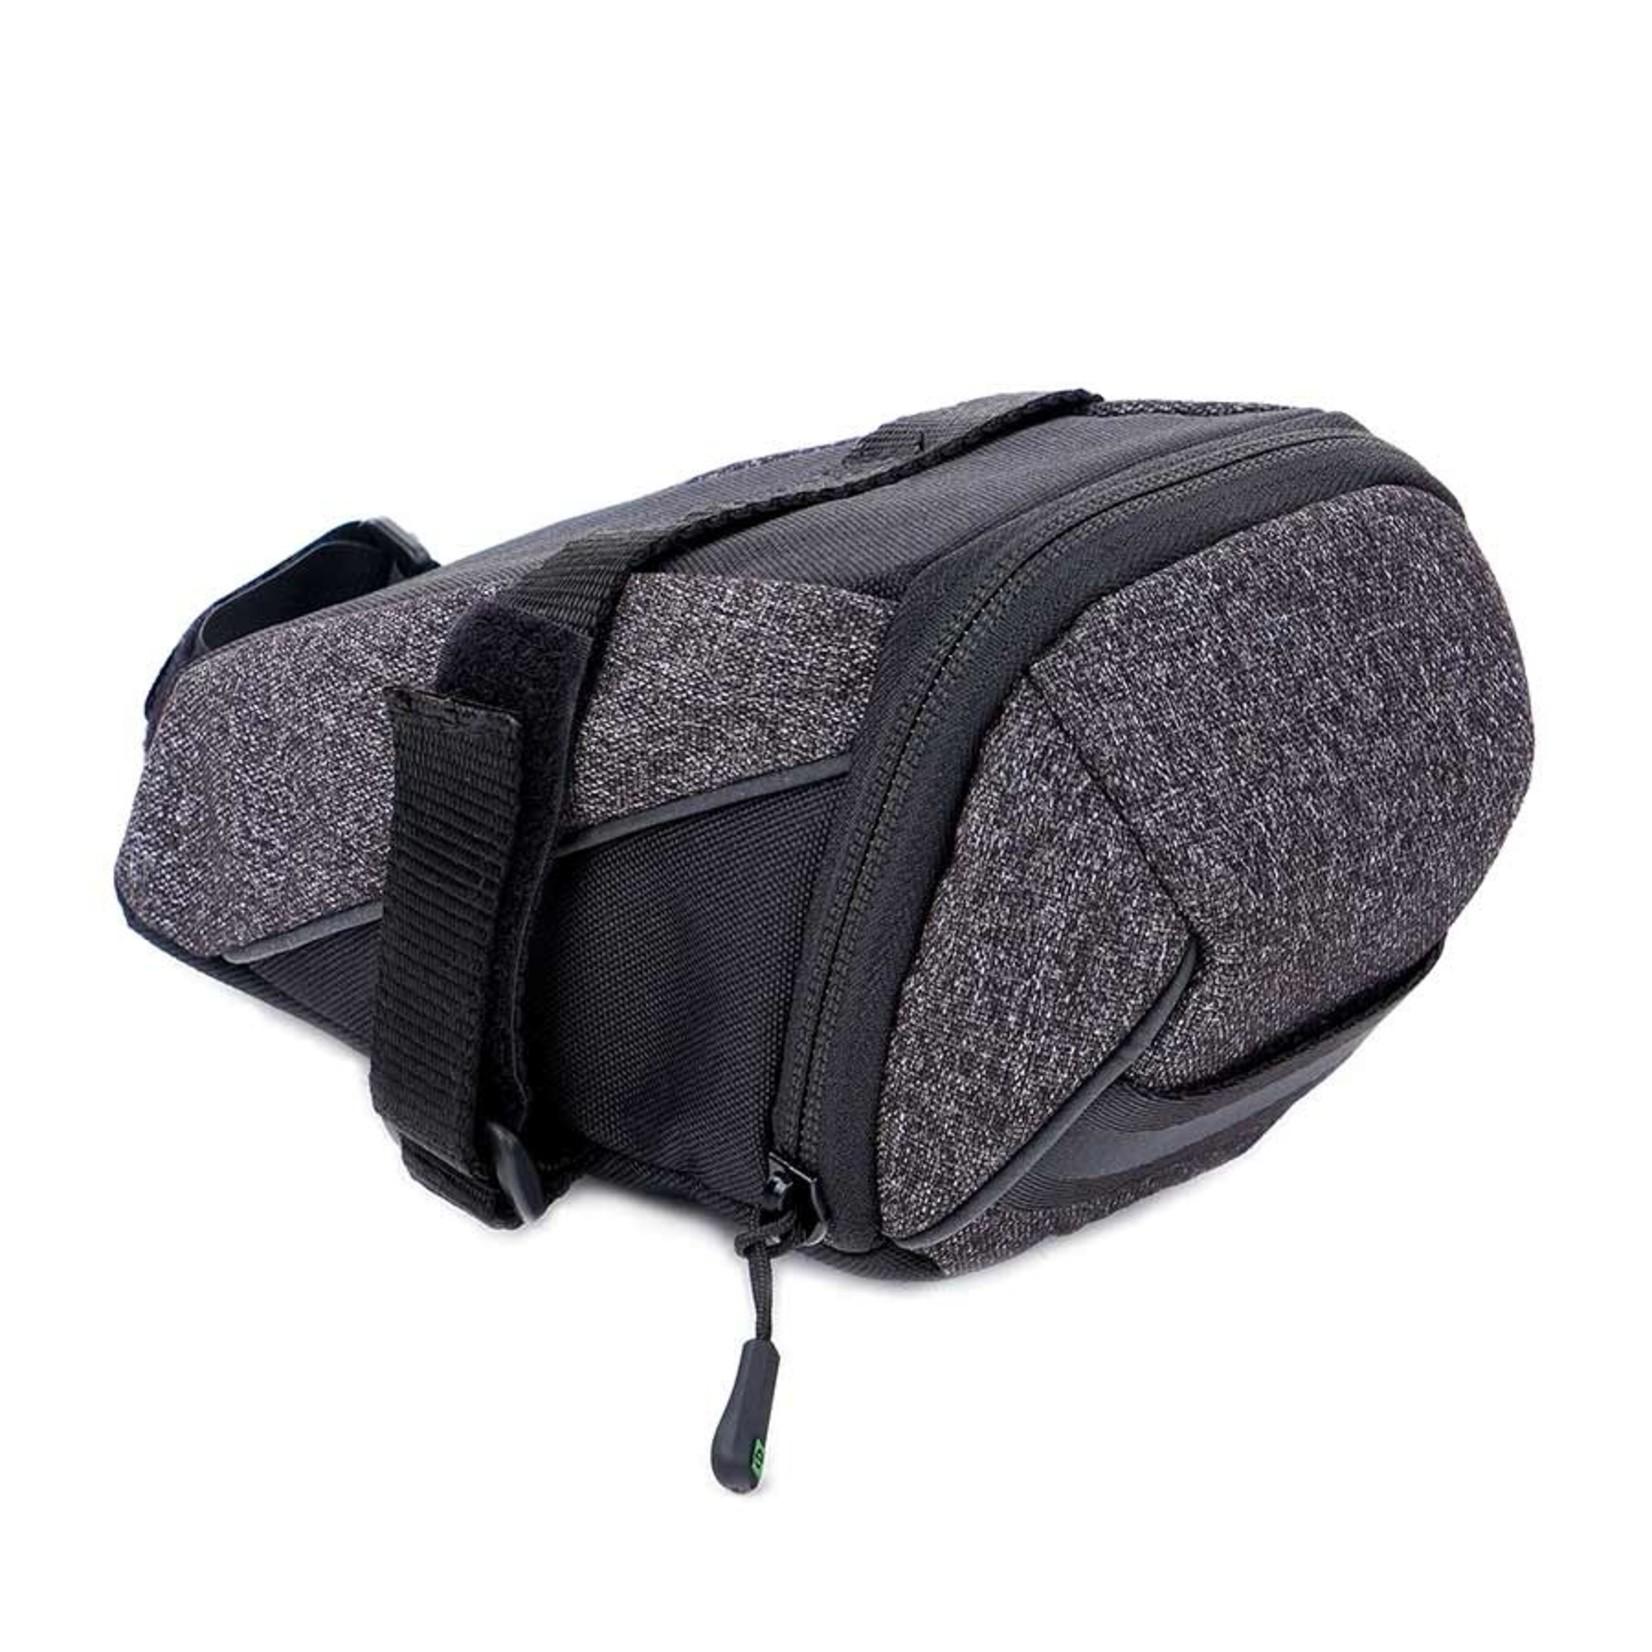 Evo Seat Bag